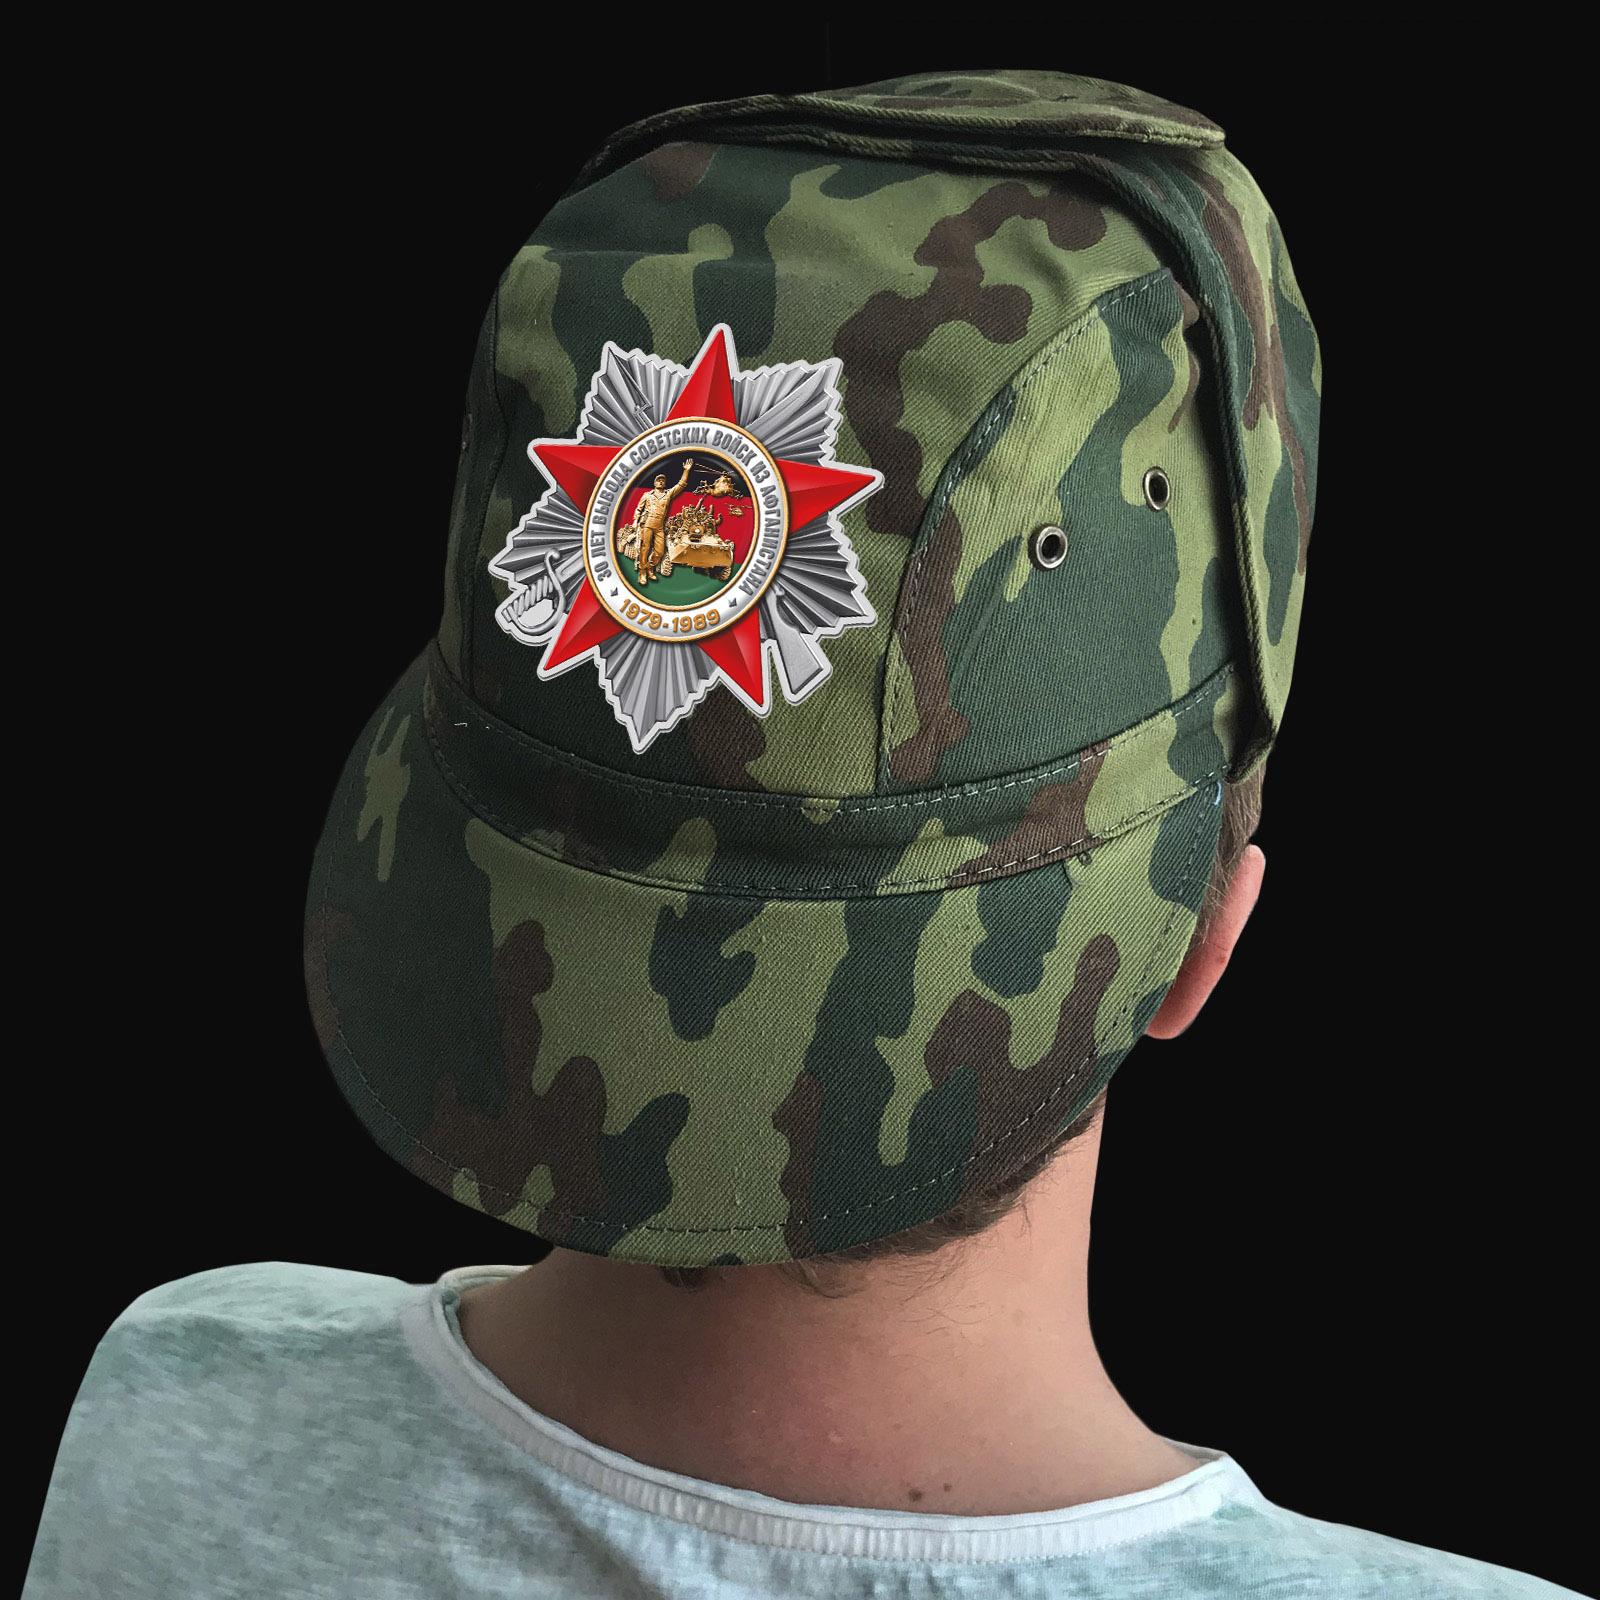 Заказать онлайн кепки мужские